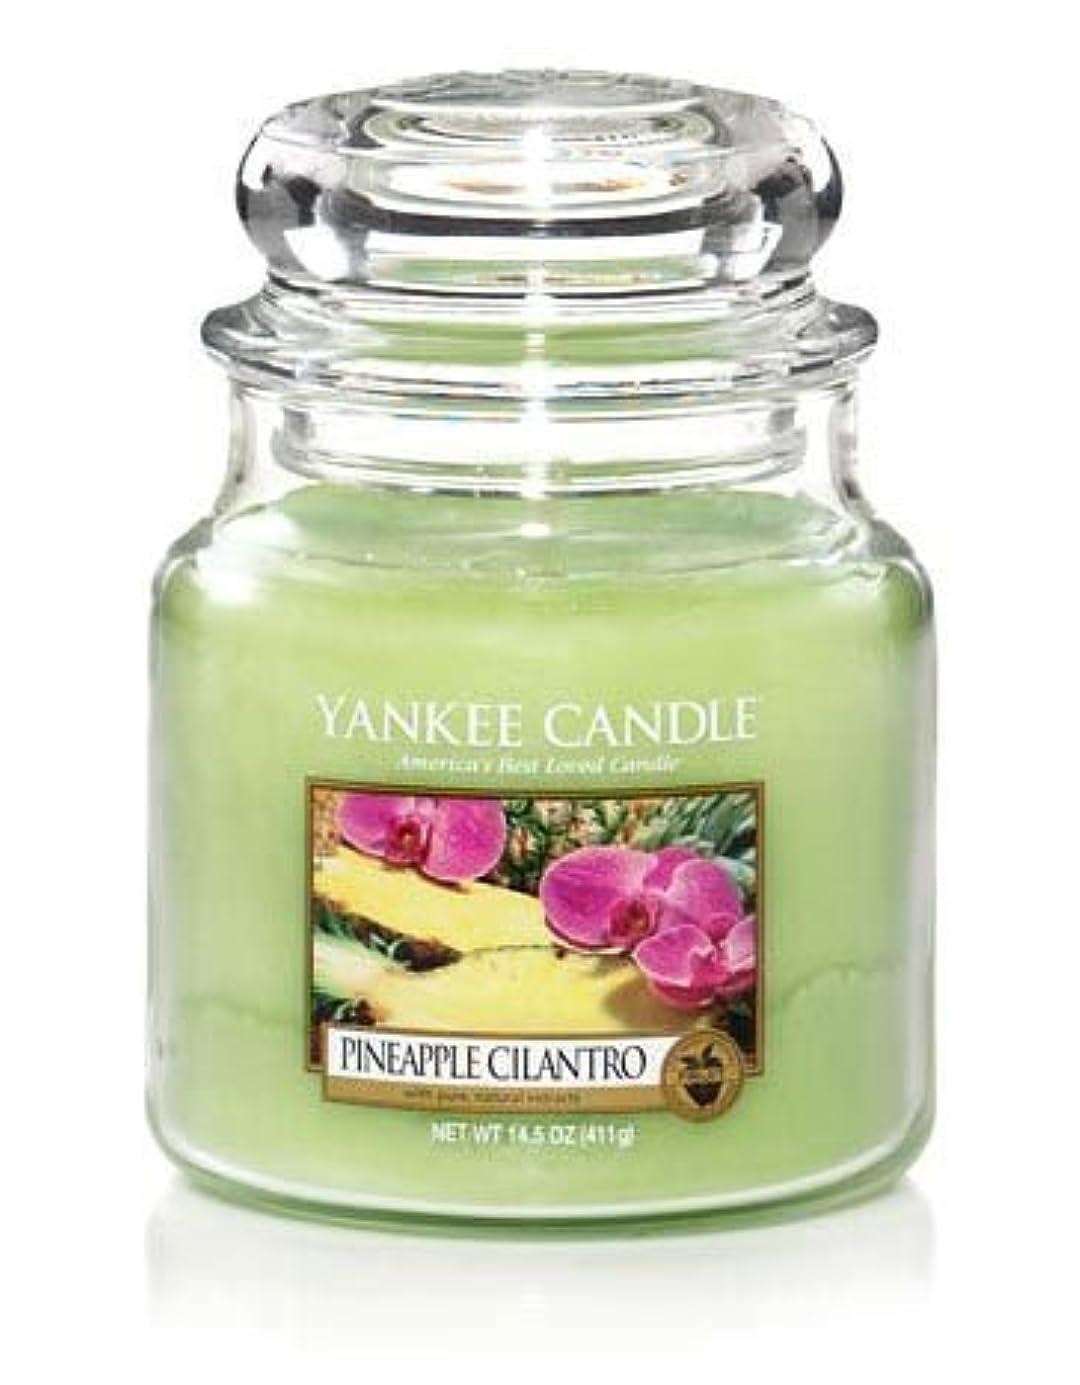 Yankee Candle Pineapple Cilantro Medium Jar 14.5oz Candle by Amazon source [並行輸入品]